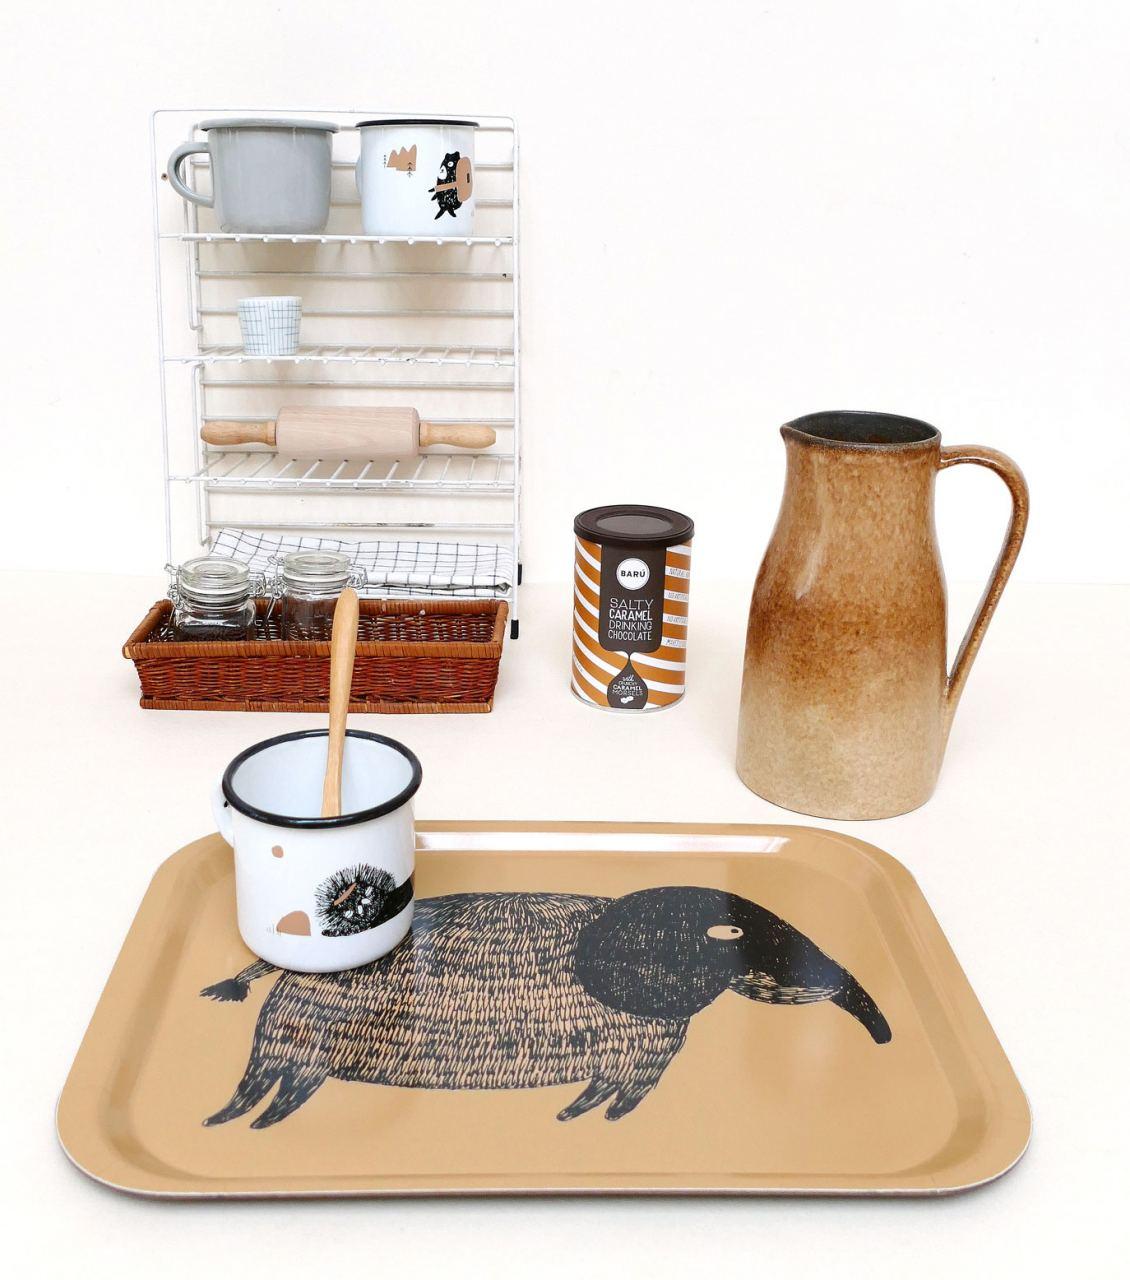 Ted & Tone Tablett Elefant (27 x 38cm)